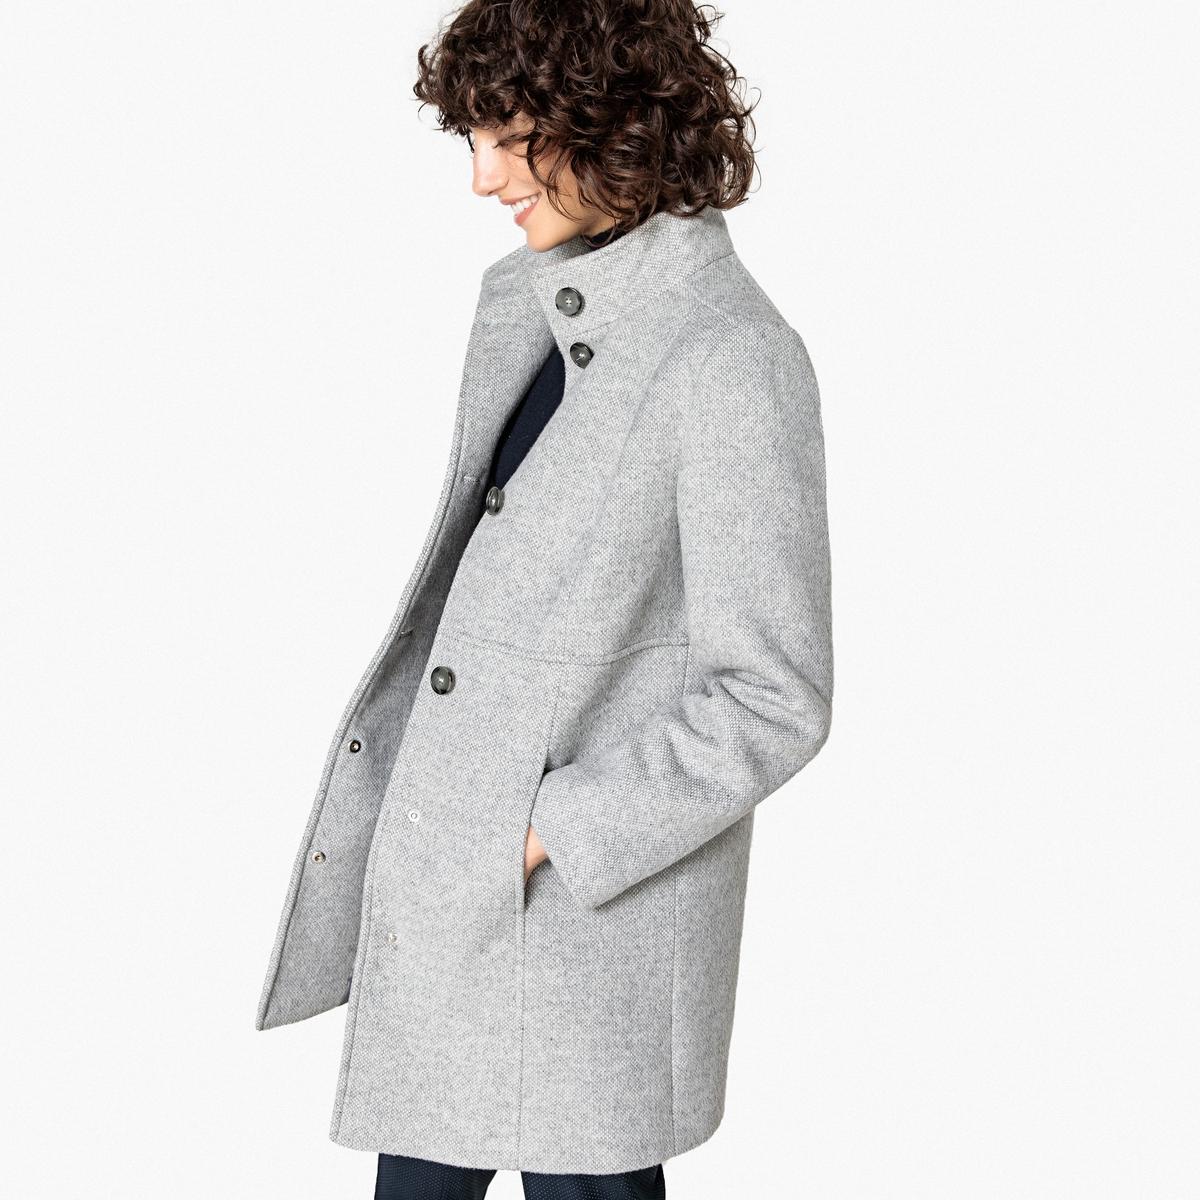 Abrigo de lana mezclada con cuello alto